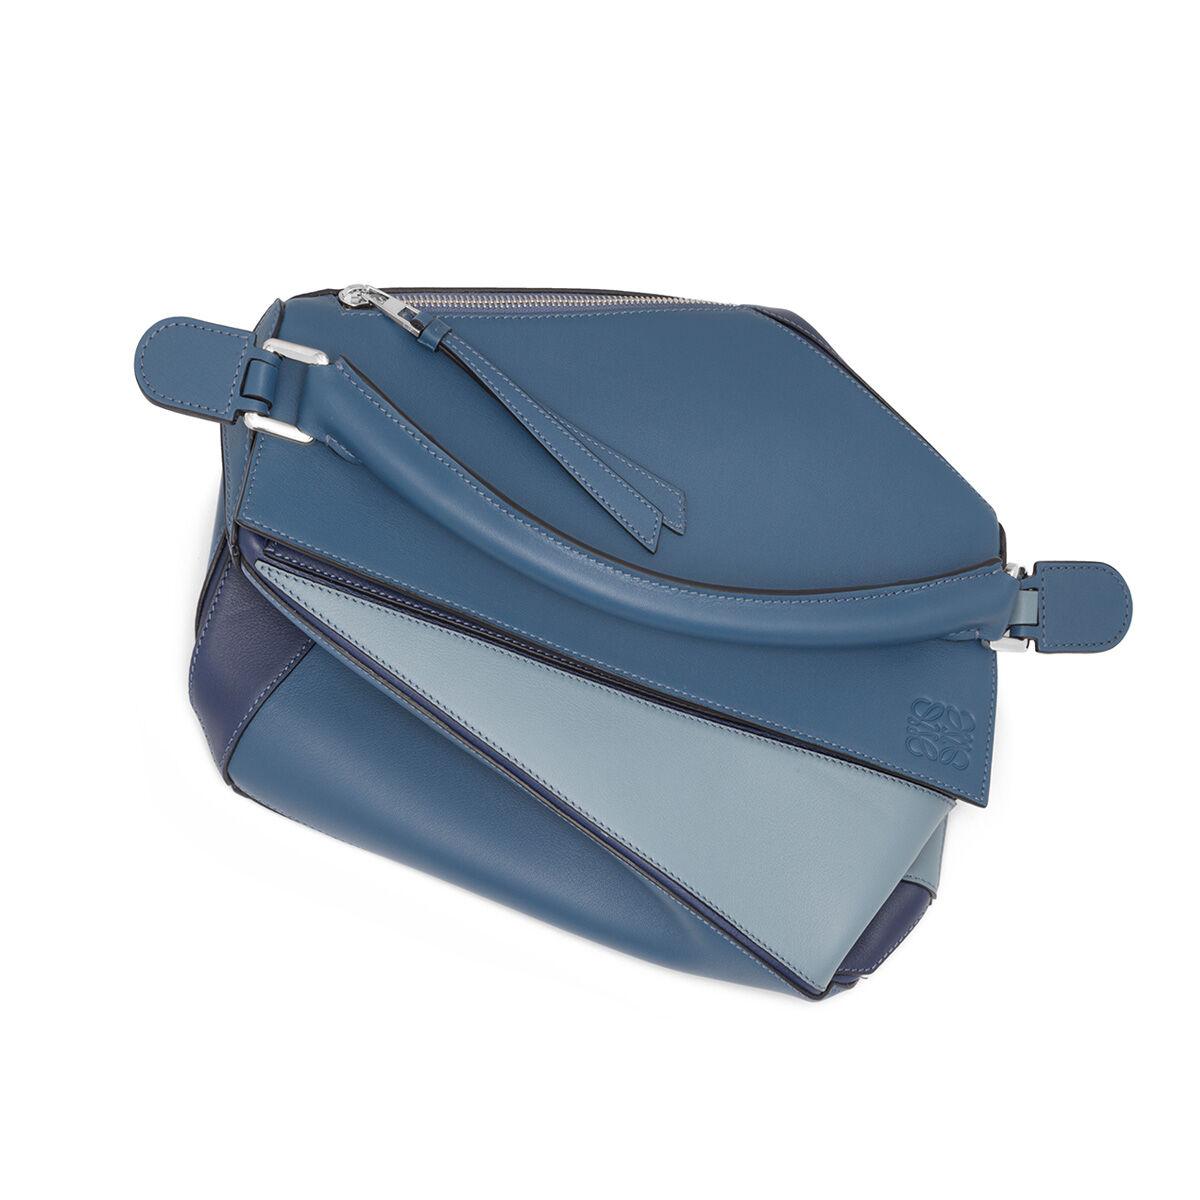 LOEWE Bolso Puzzle Azul Varsity Multitono all